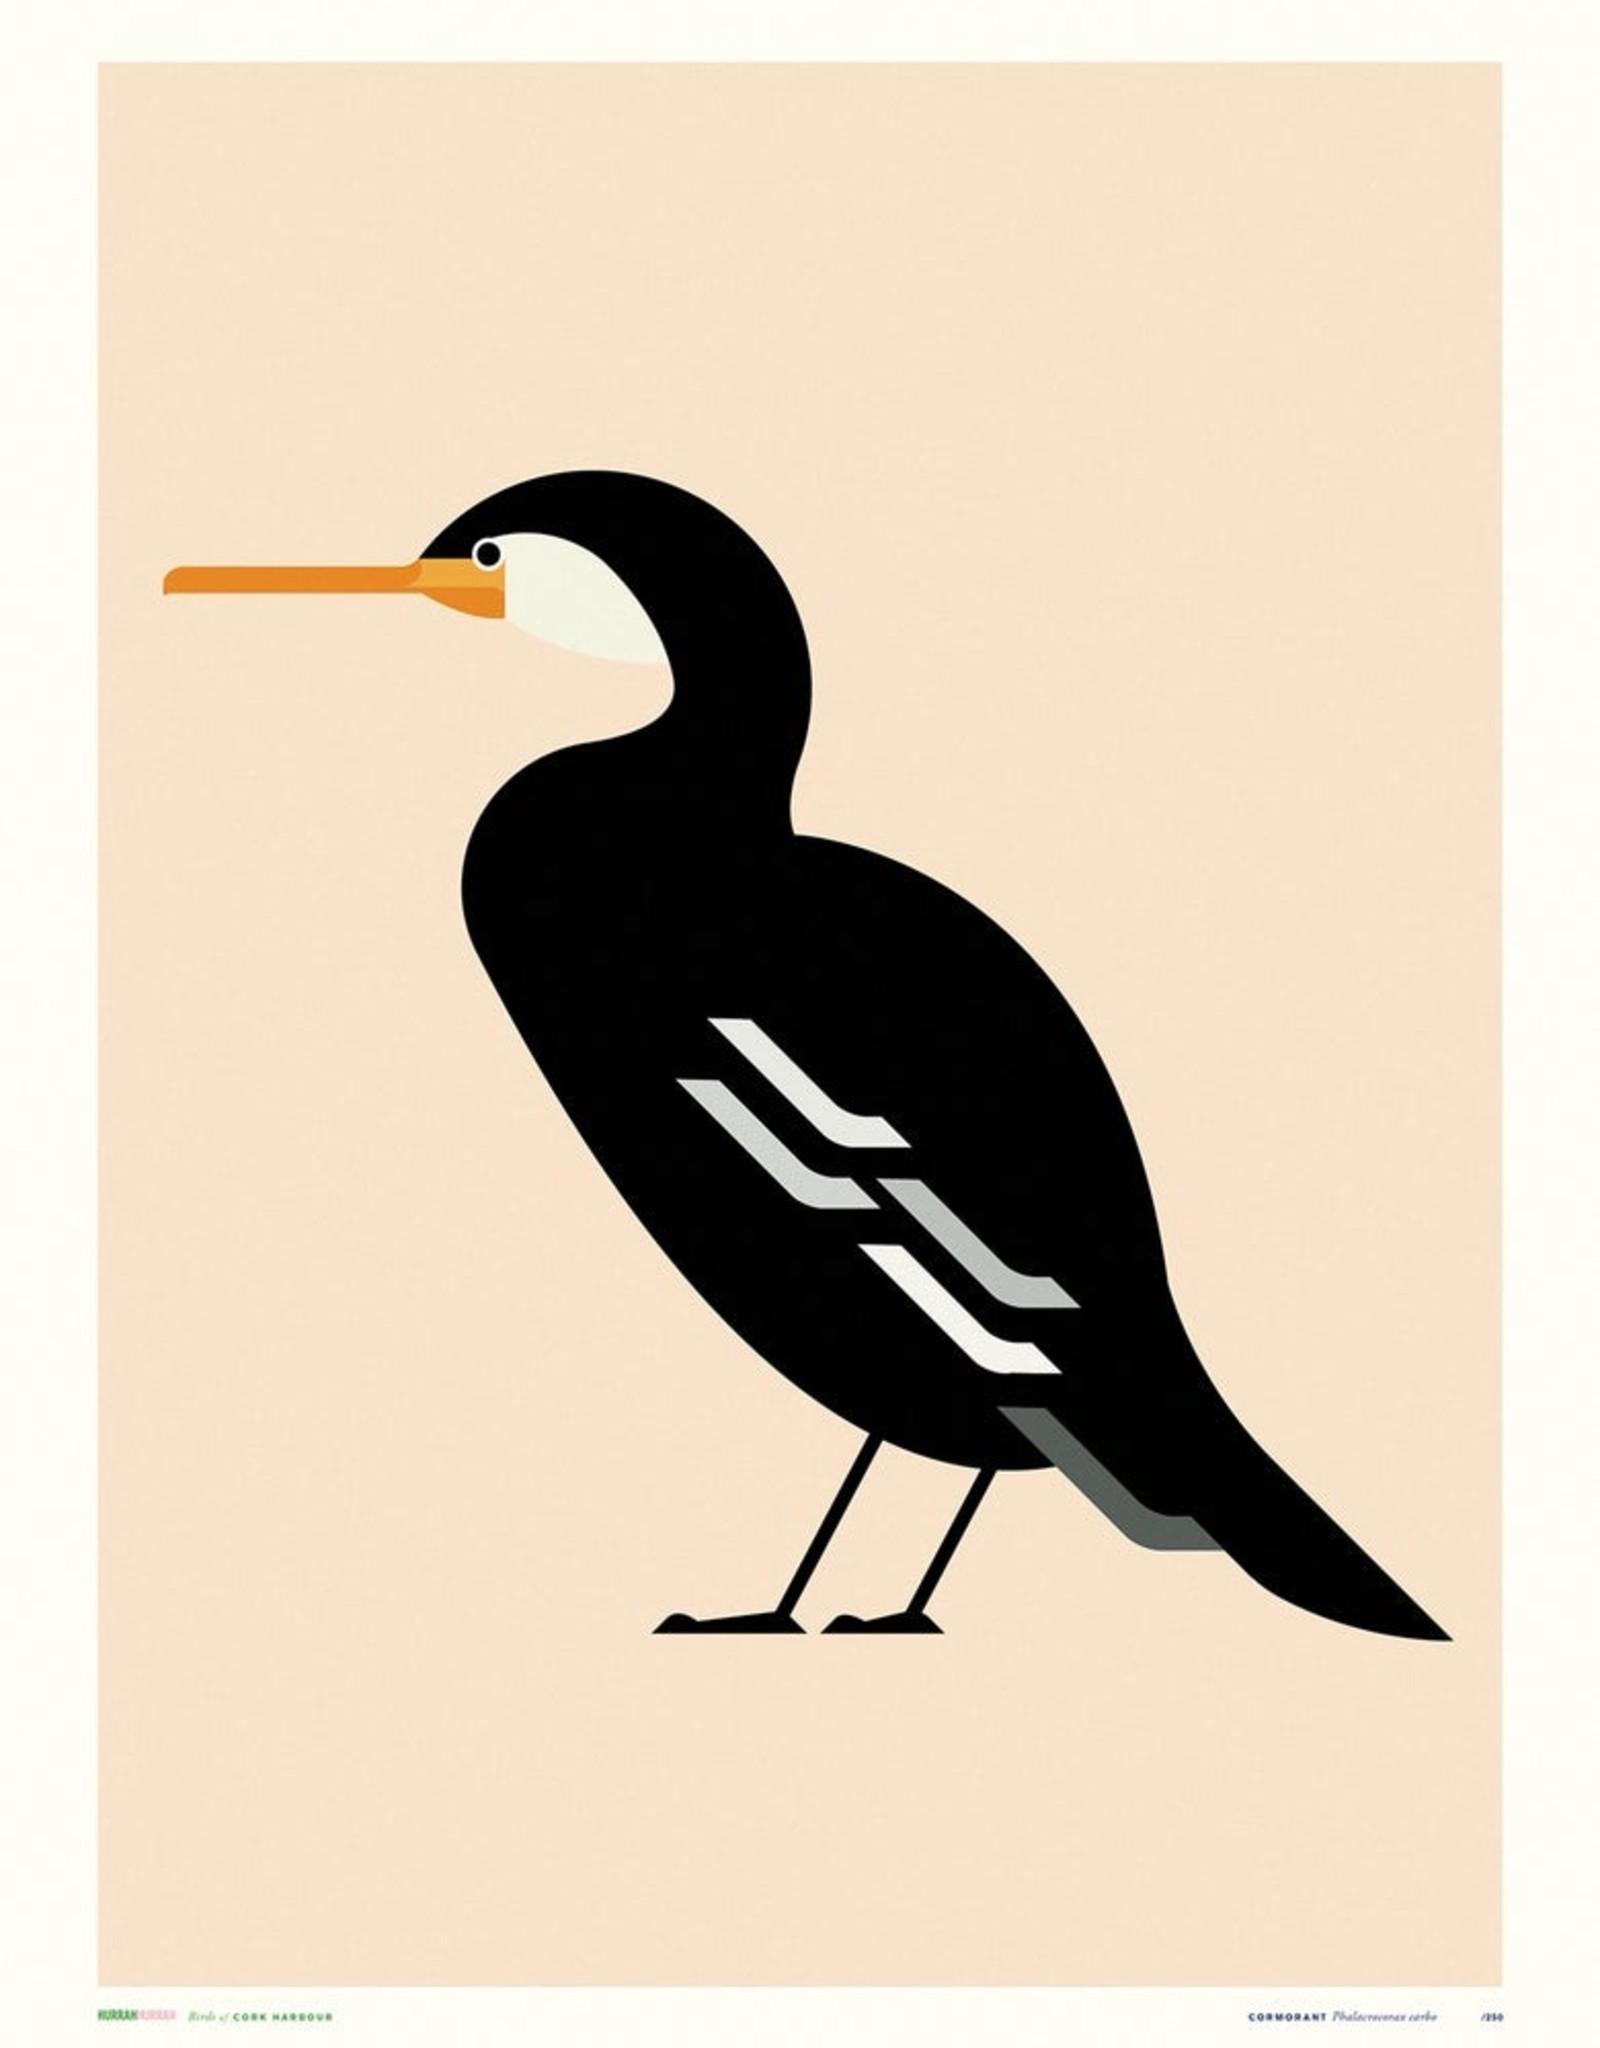 Hurrah Hurrah Hurrah Hurrah Cormorant